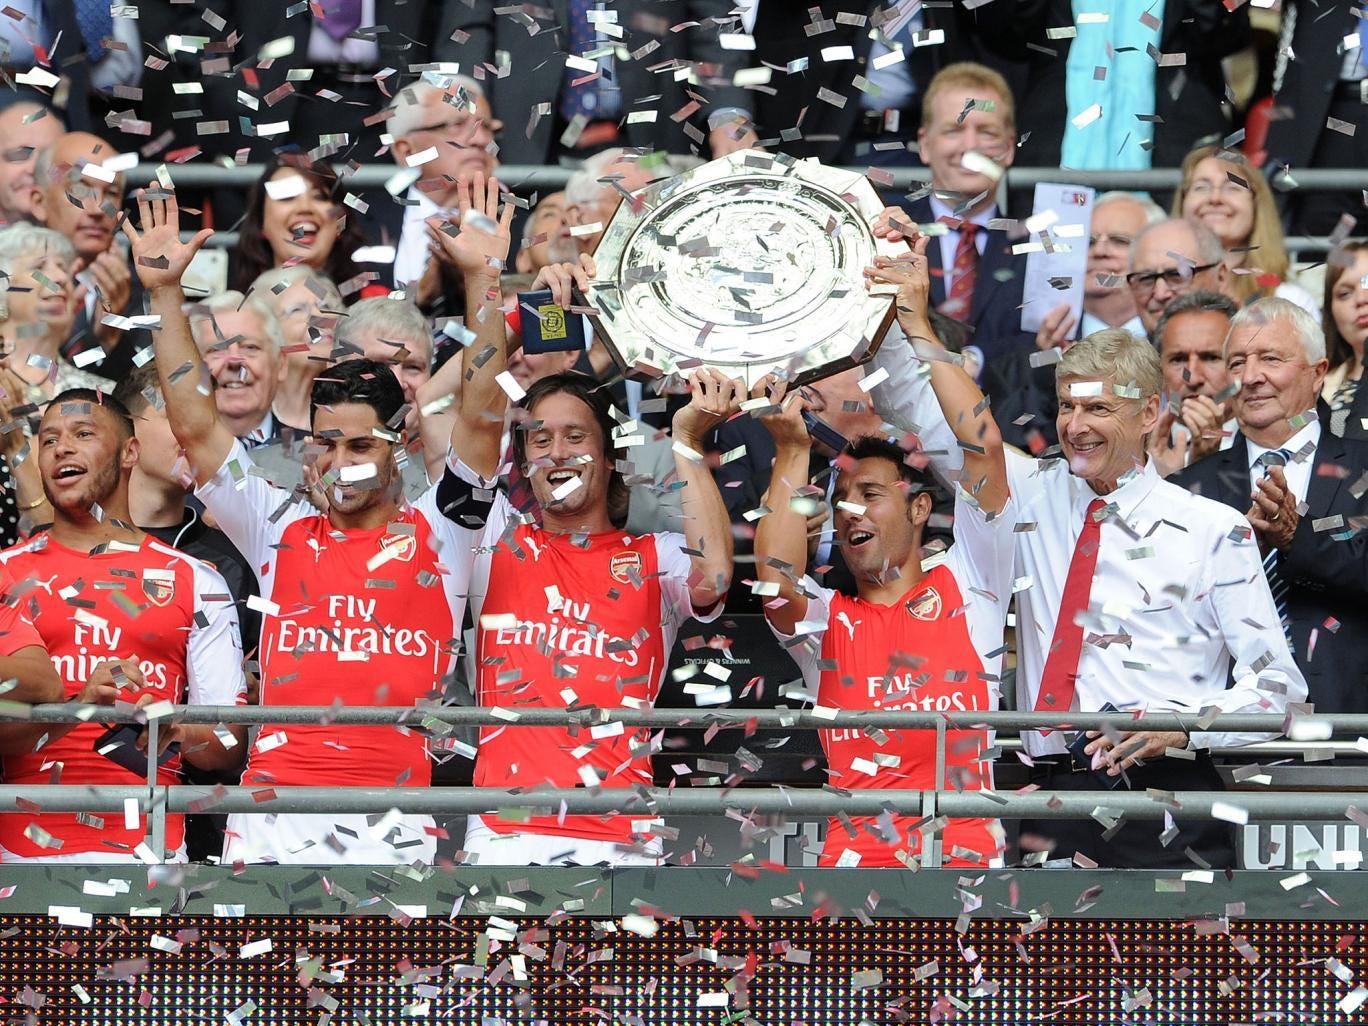 Arsenal lifts the Community Shield after beating Manchester City 3-0 at Wembley